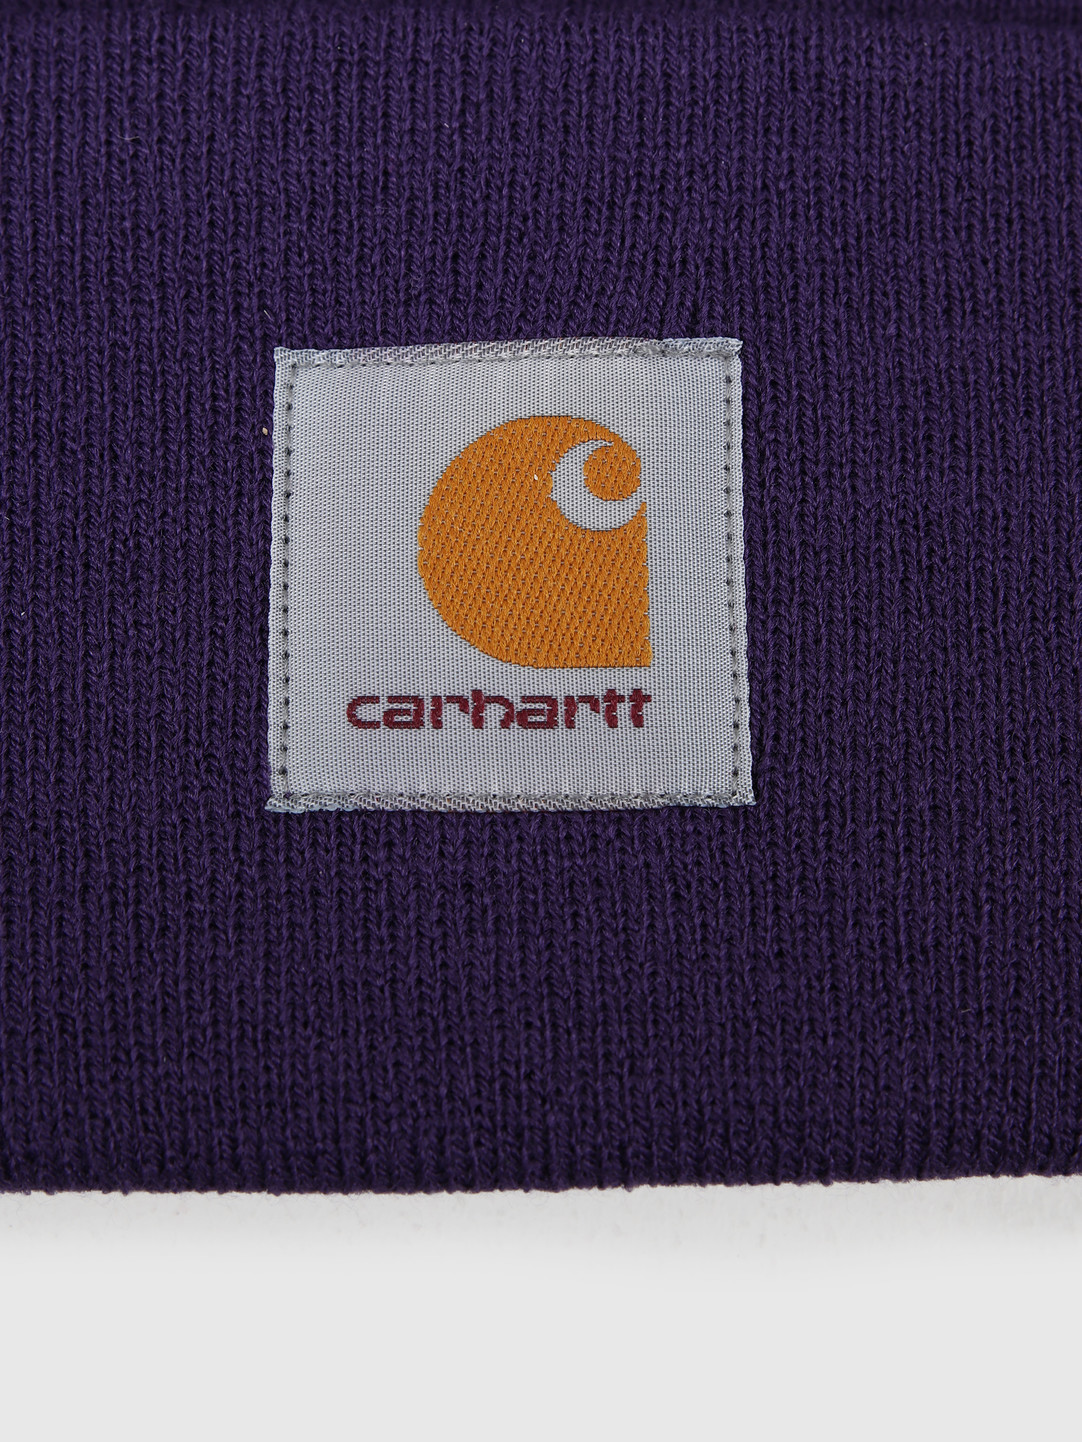 Carhartt WIP Carhartt WIP Acrylic Watch Hat Royal Violet I020222